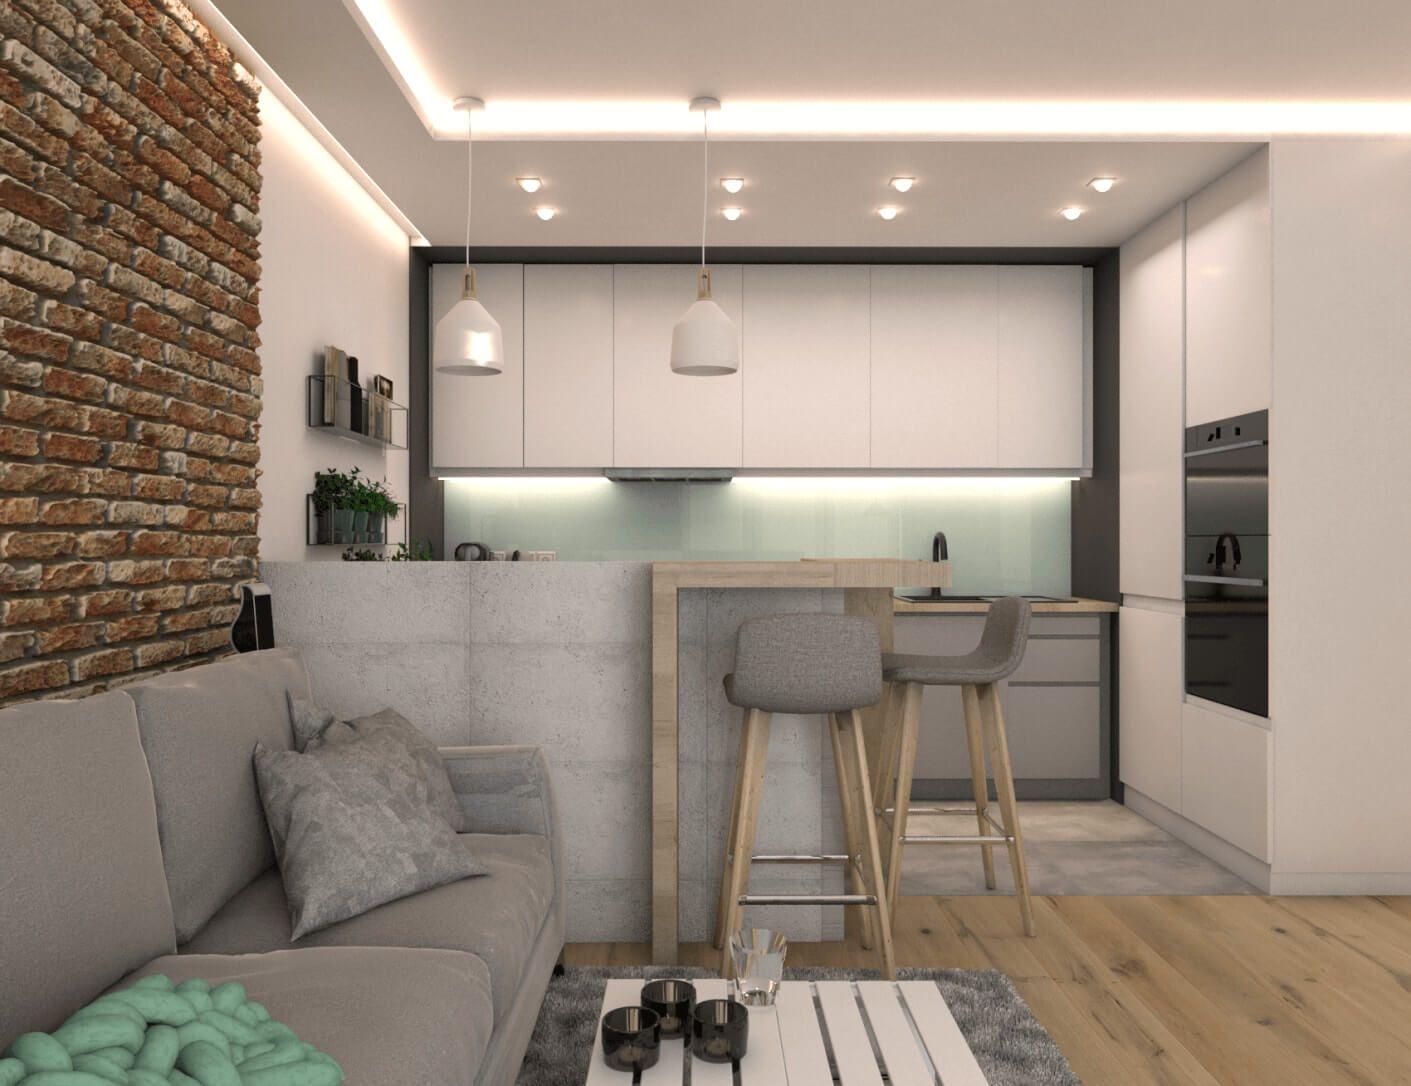 Mieszkanie W Bloku Z Lat 60 Oroconcept Pracowania Projektowania Wnetrz Small Apartment Interior Kitchen Room Design Condo Interior